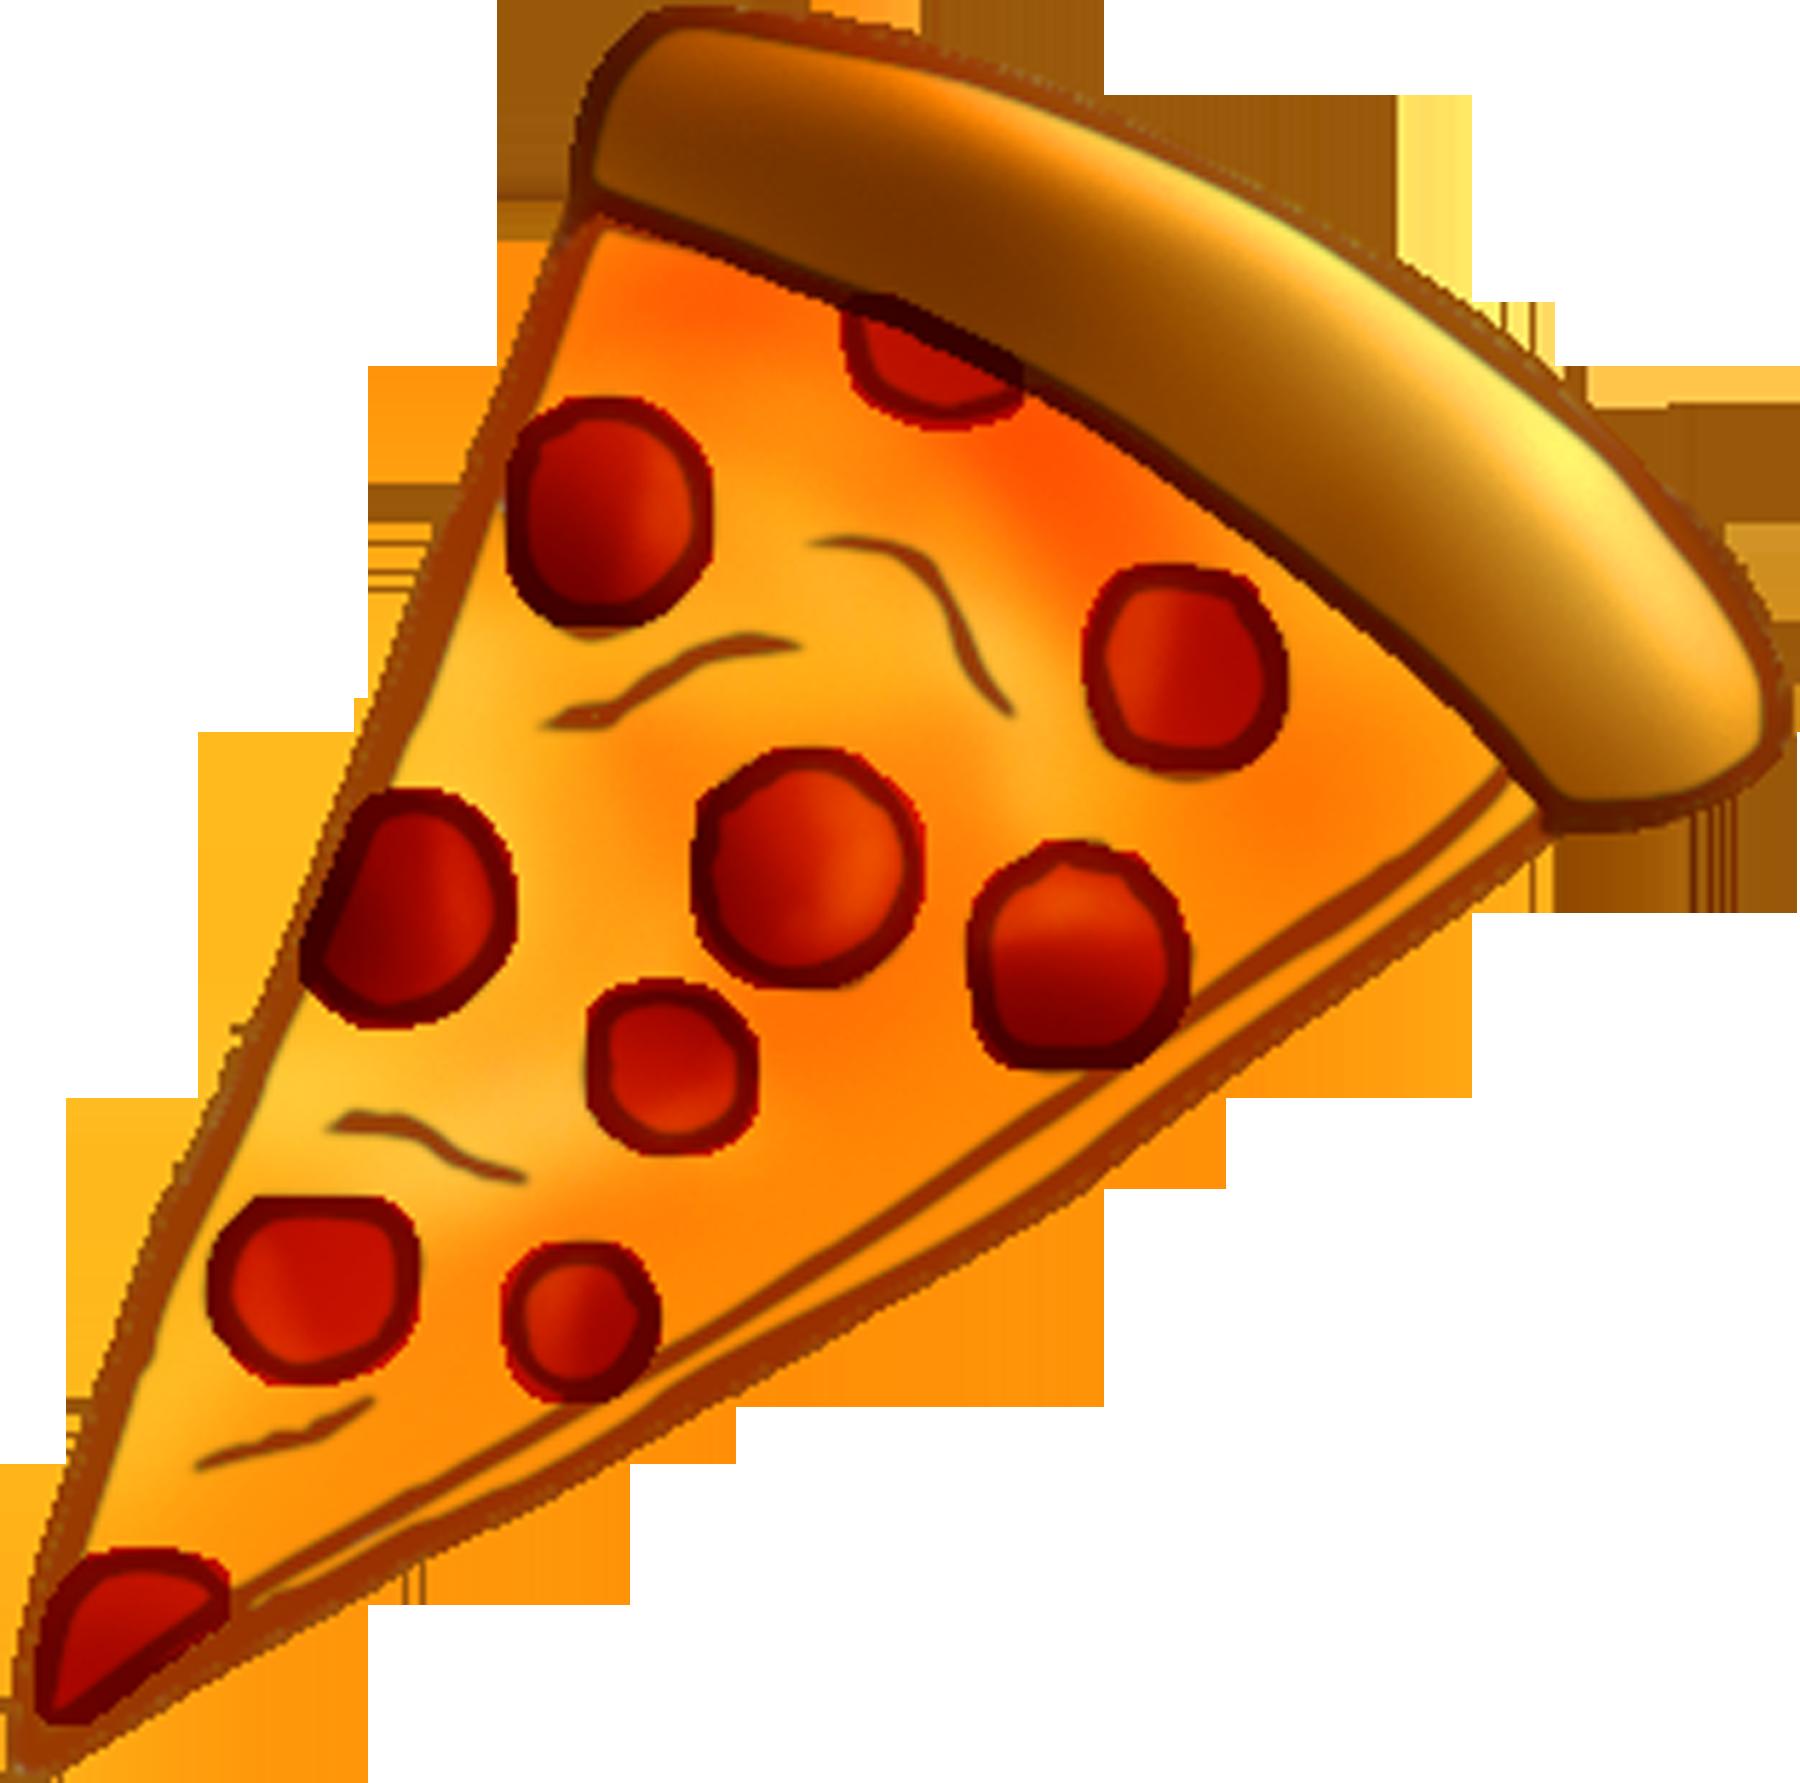 Clipart pizza pictures clip art freeuse Pizza clip art free download free clipart images - Cliparting.com clip art freeuse